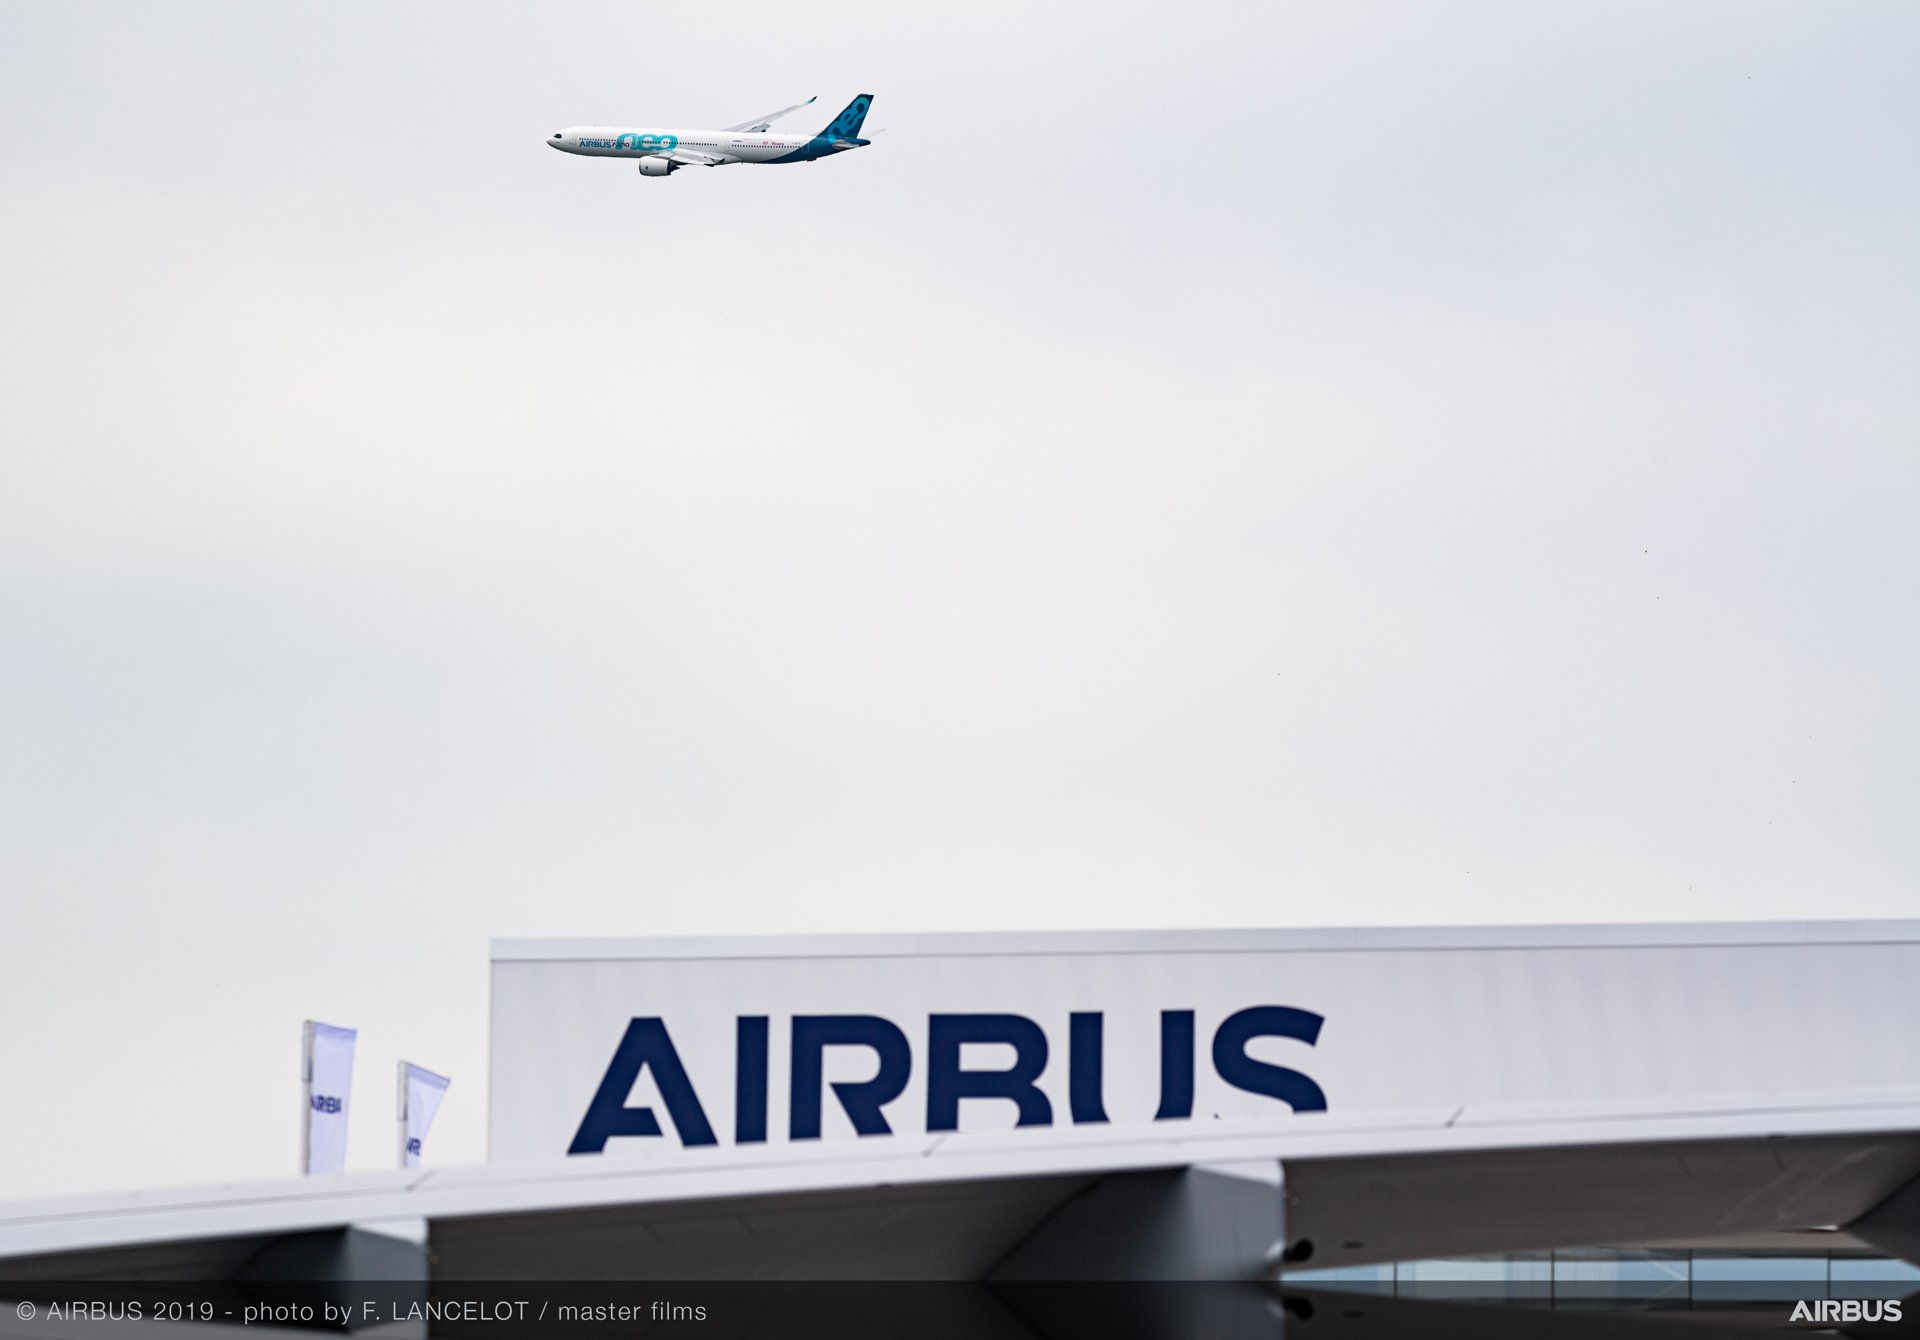 A330-900 Flying Display at Paris Airshow - PAS2019 Day 2